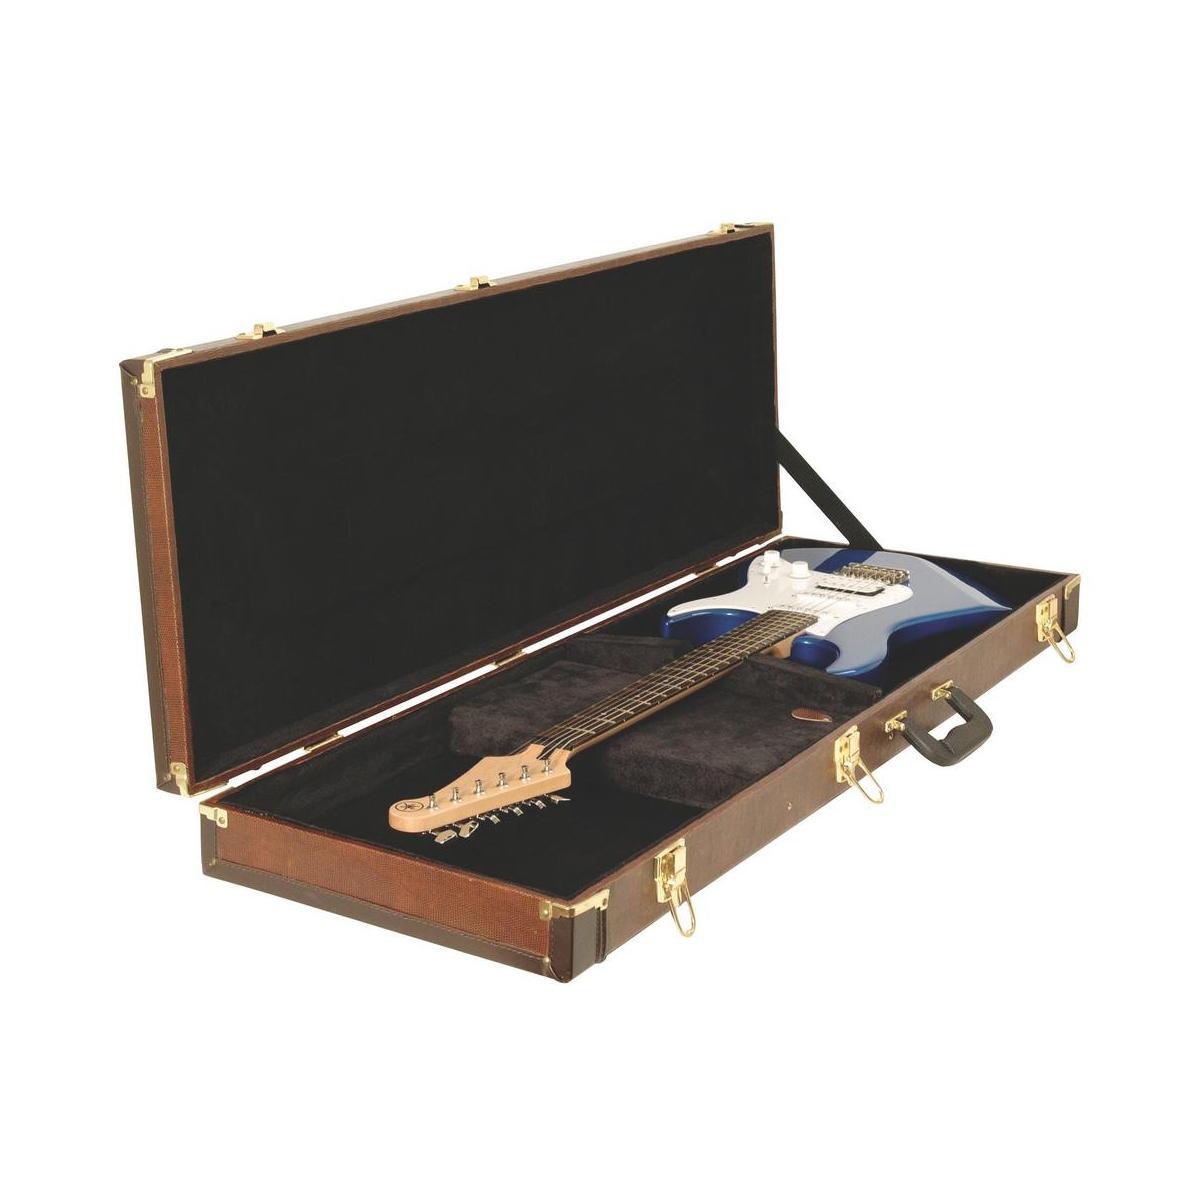 on stage gce6000s electric guitar hard case snakeskin musical instruments. Black Bedroom Furniture Sets. Home Design Ideas